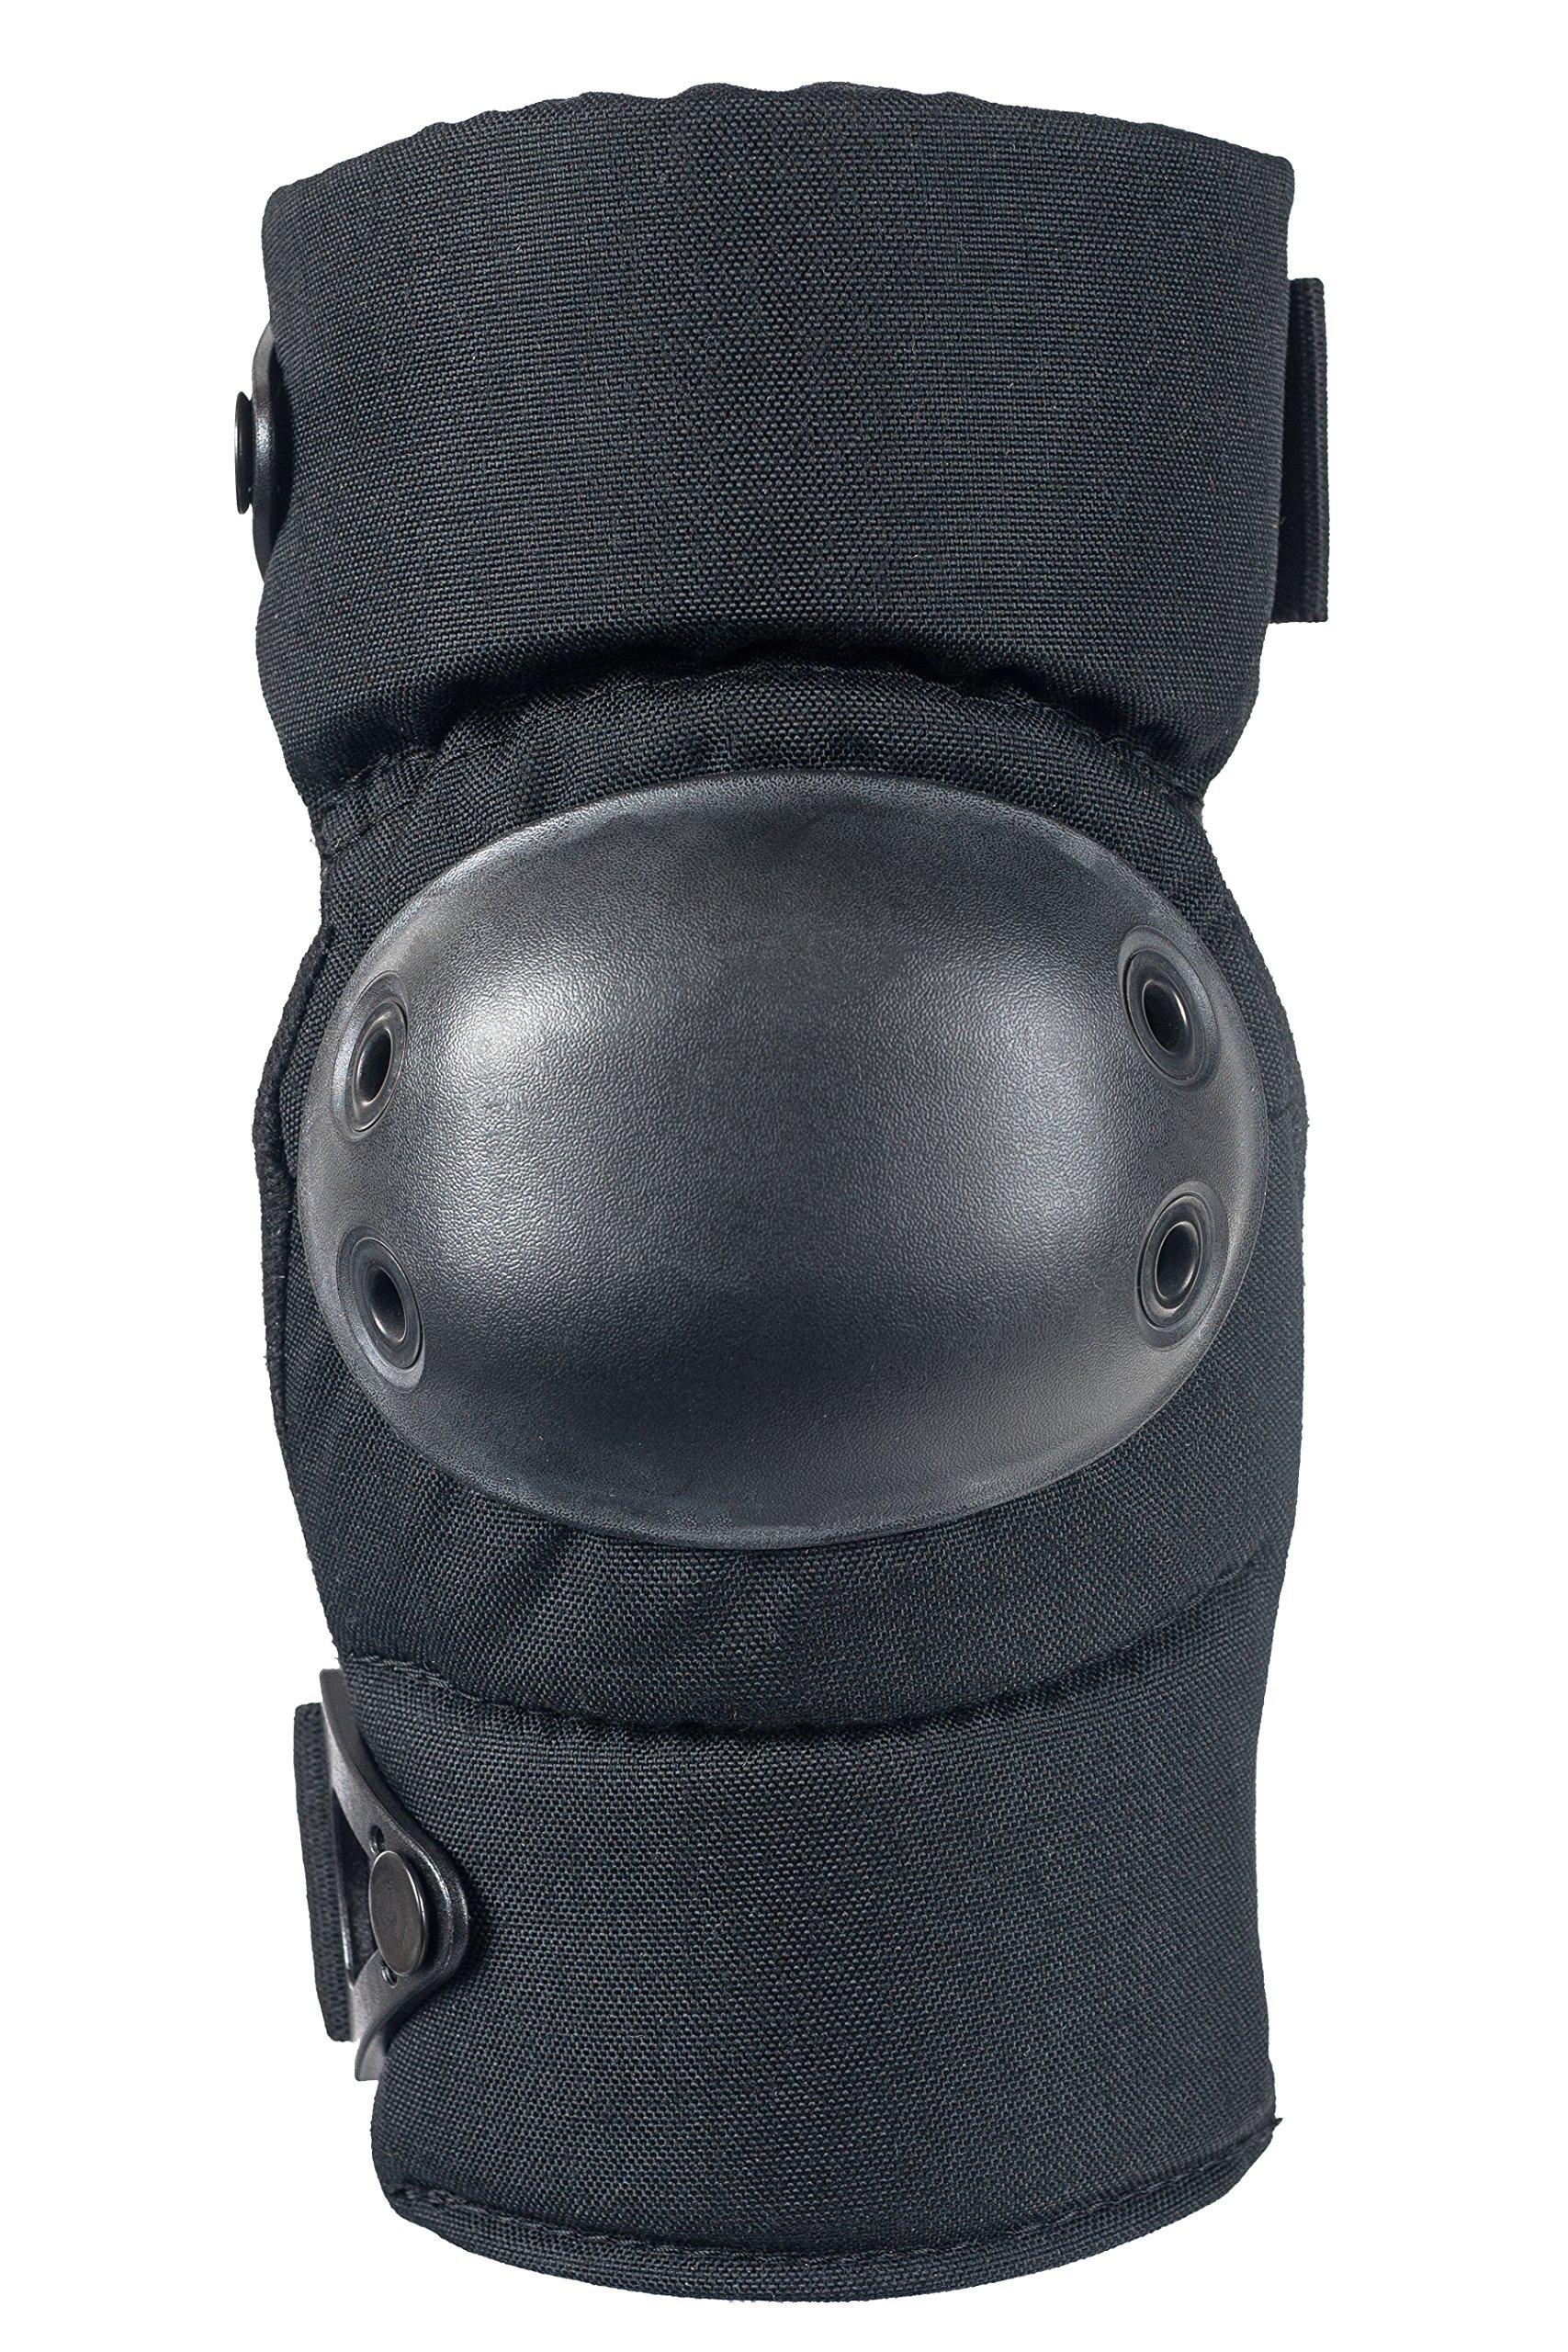 ALTA 53113.00 AltaCONTOUR Elbow Protector Pad, Black Cordura Nylon Fabric, AltaLOK Fastening, Flexible Cap, Round, Black